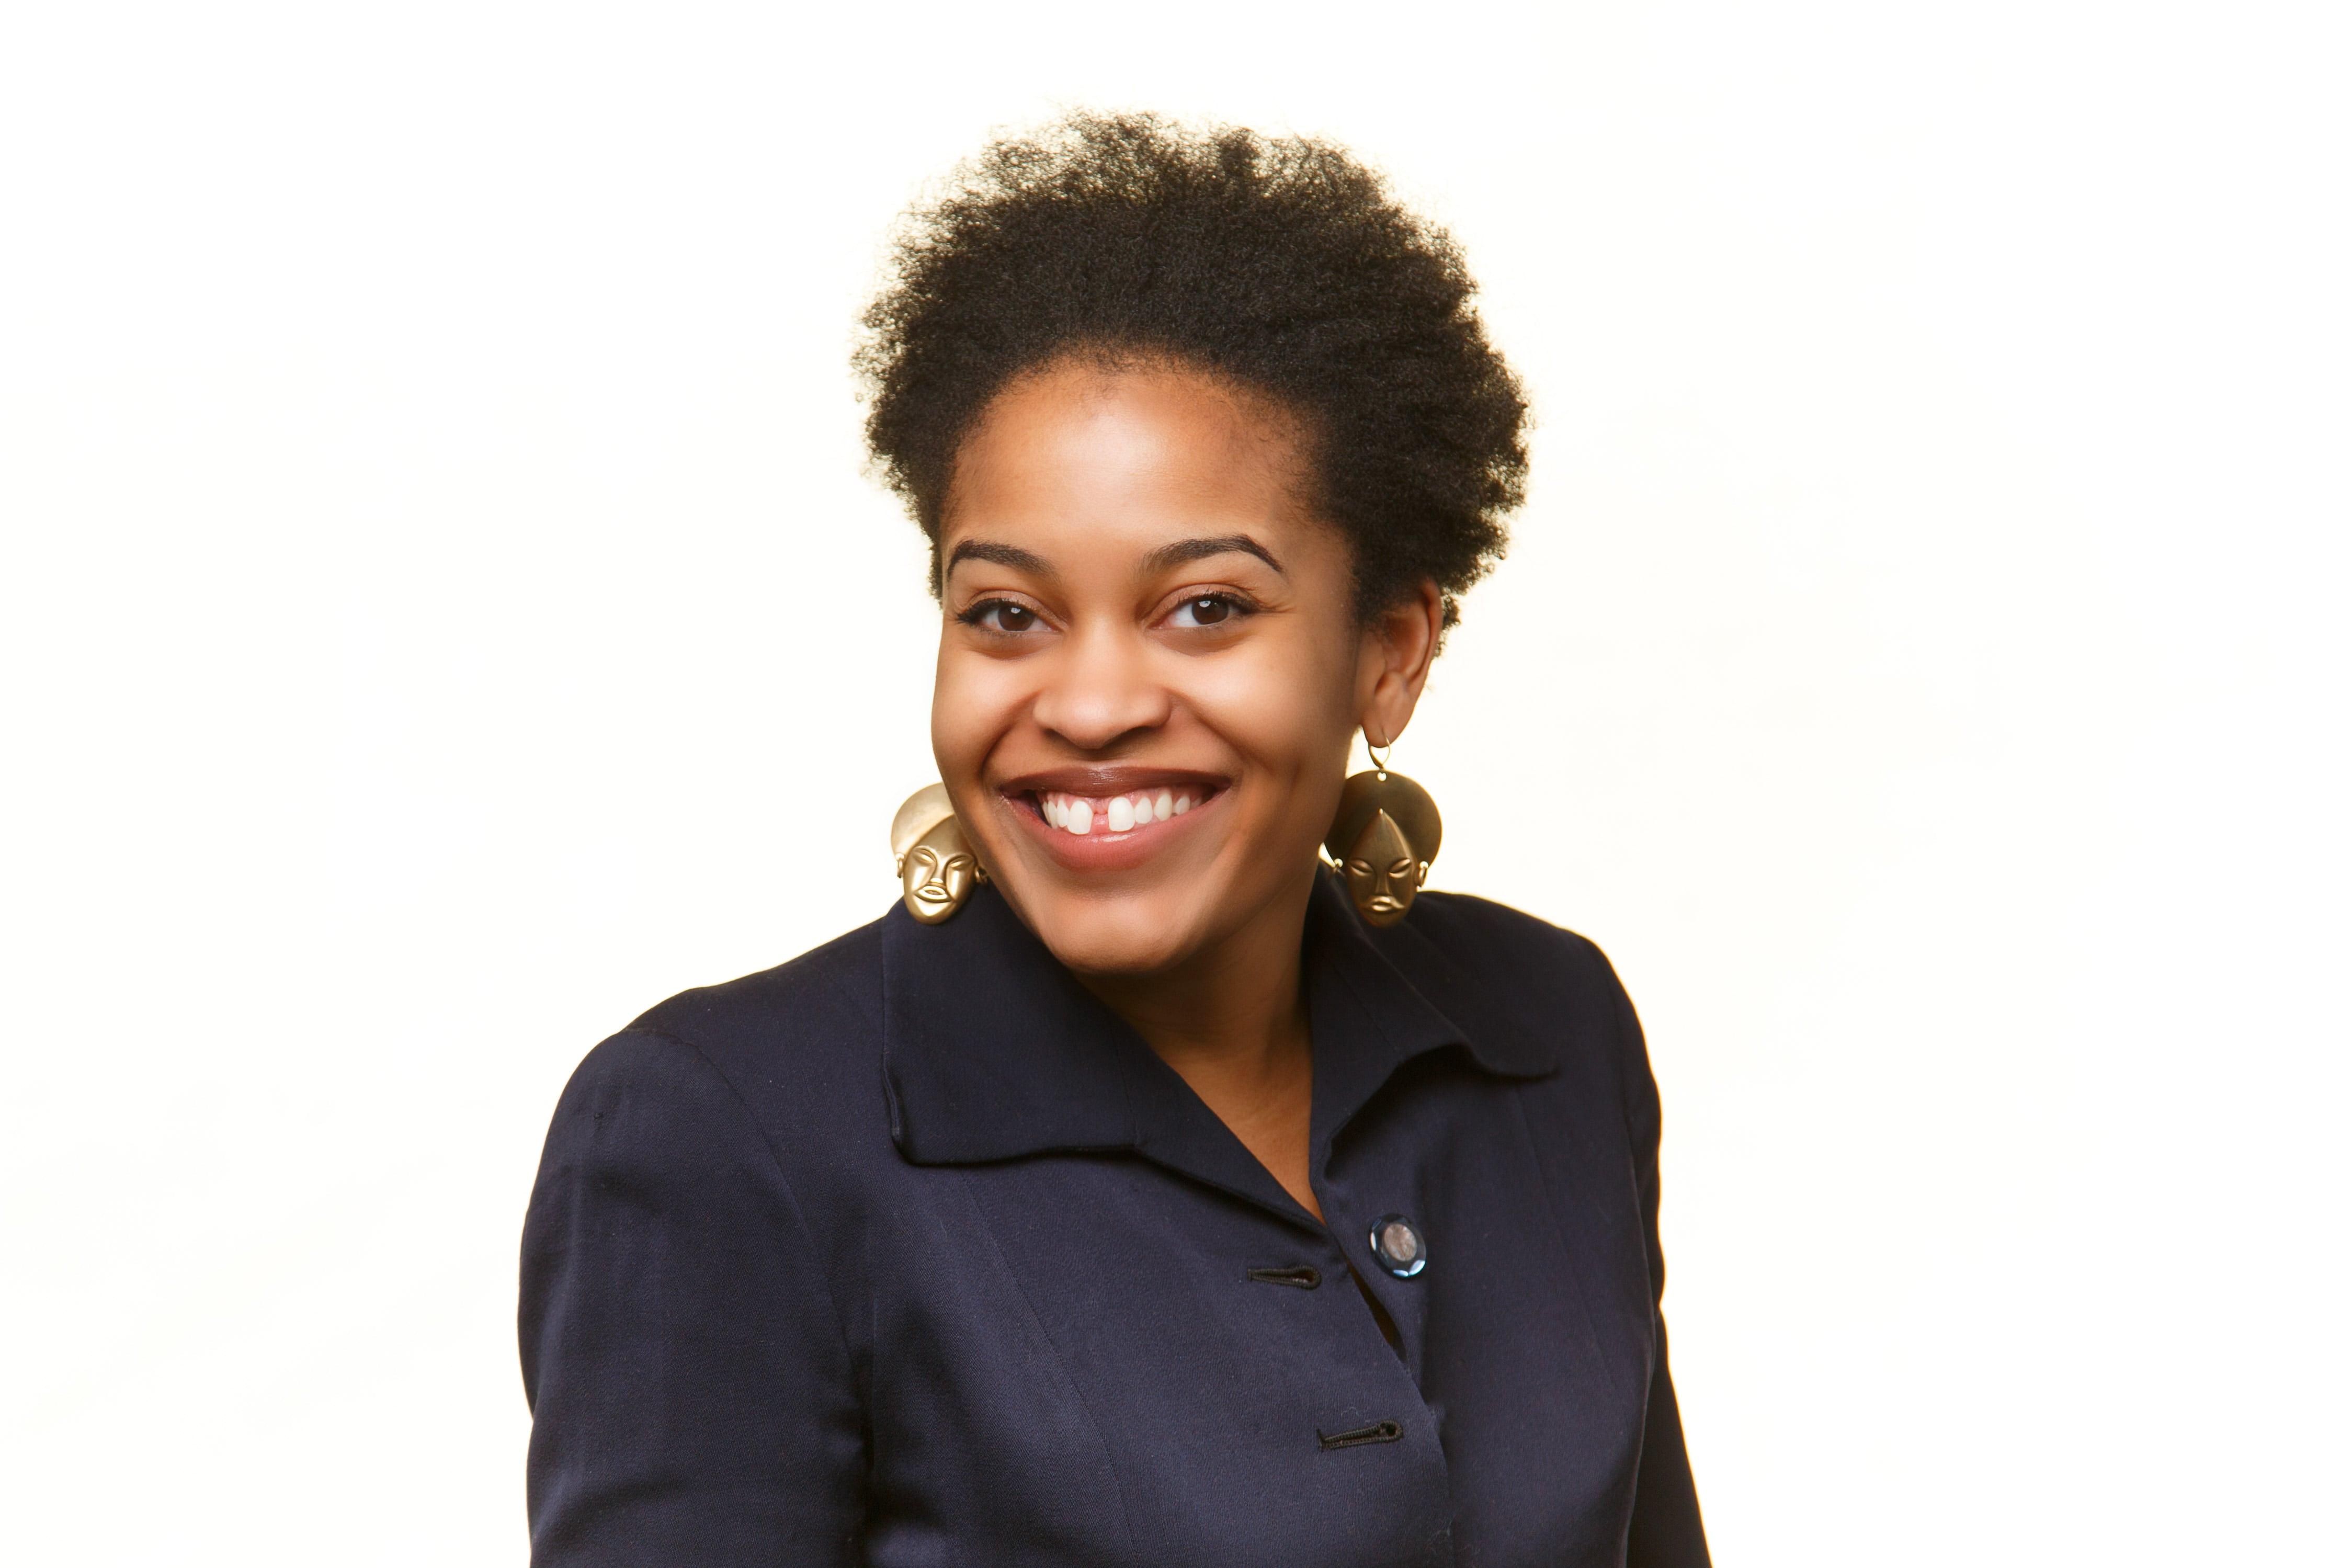 2015 New Voices Scholar Ayana Contreras